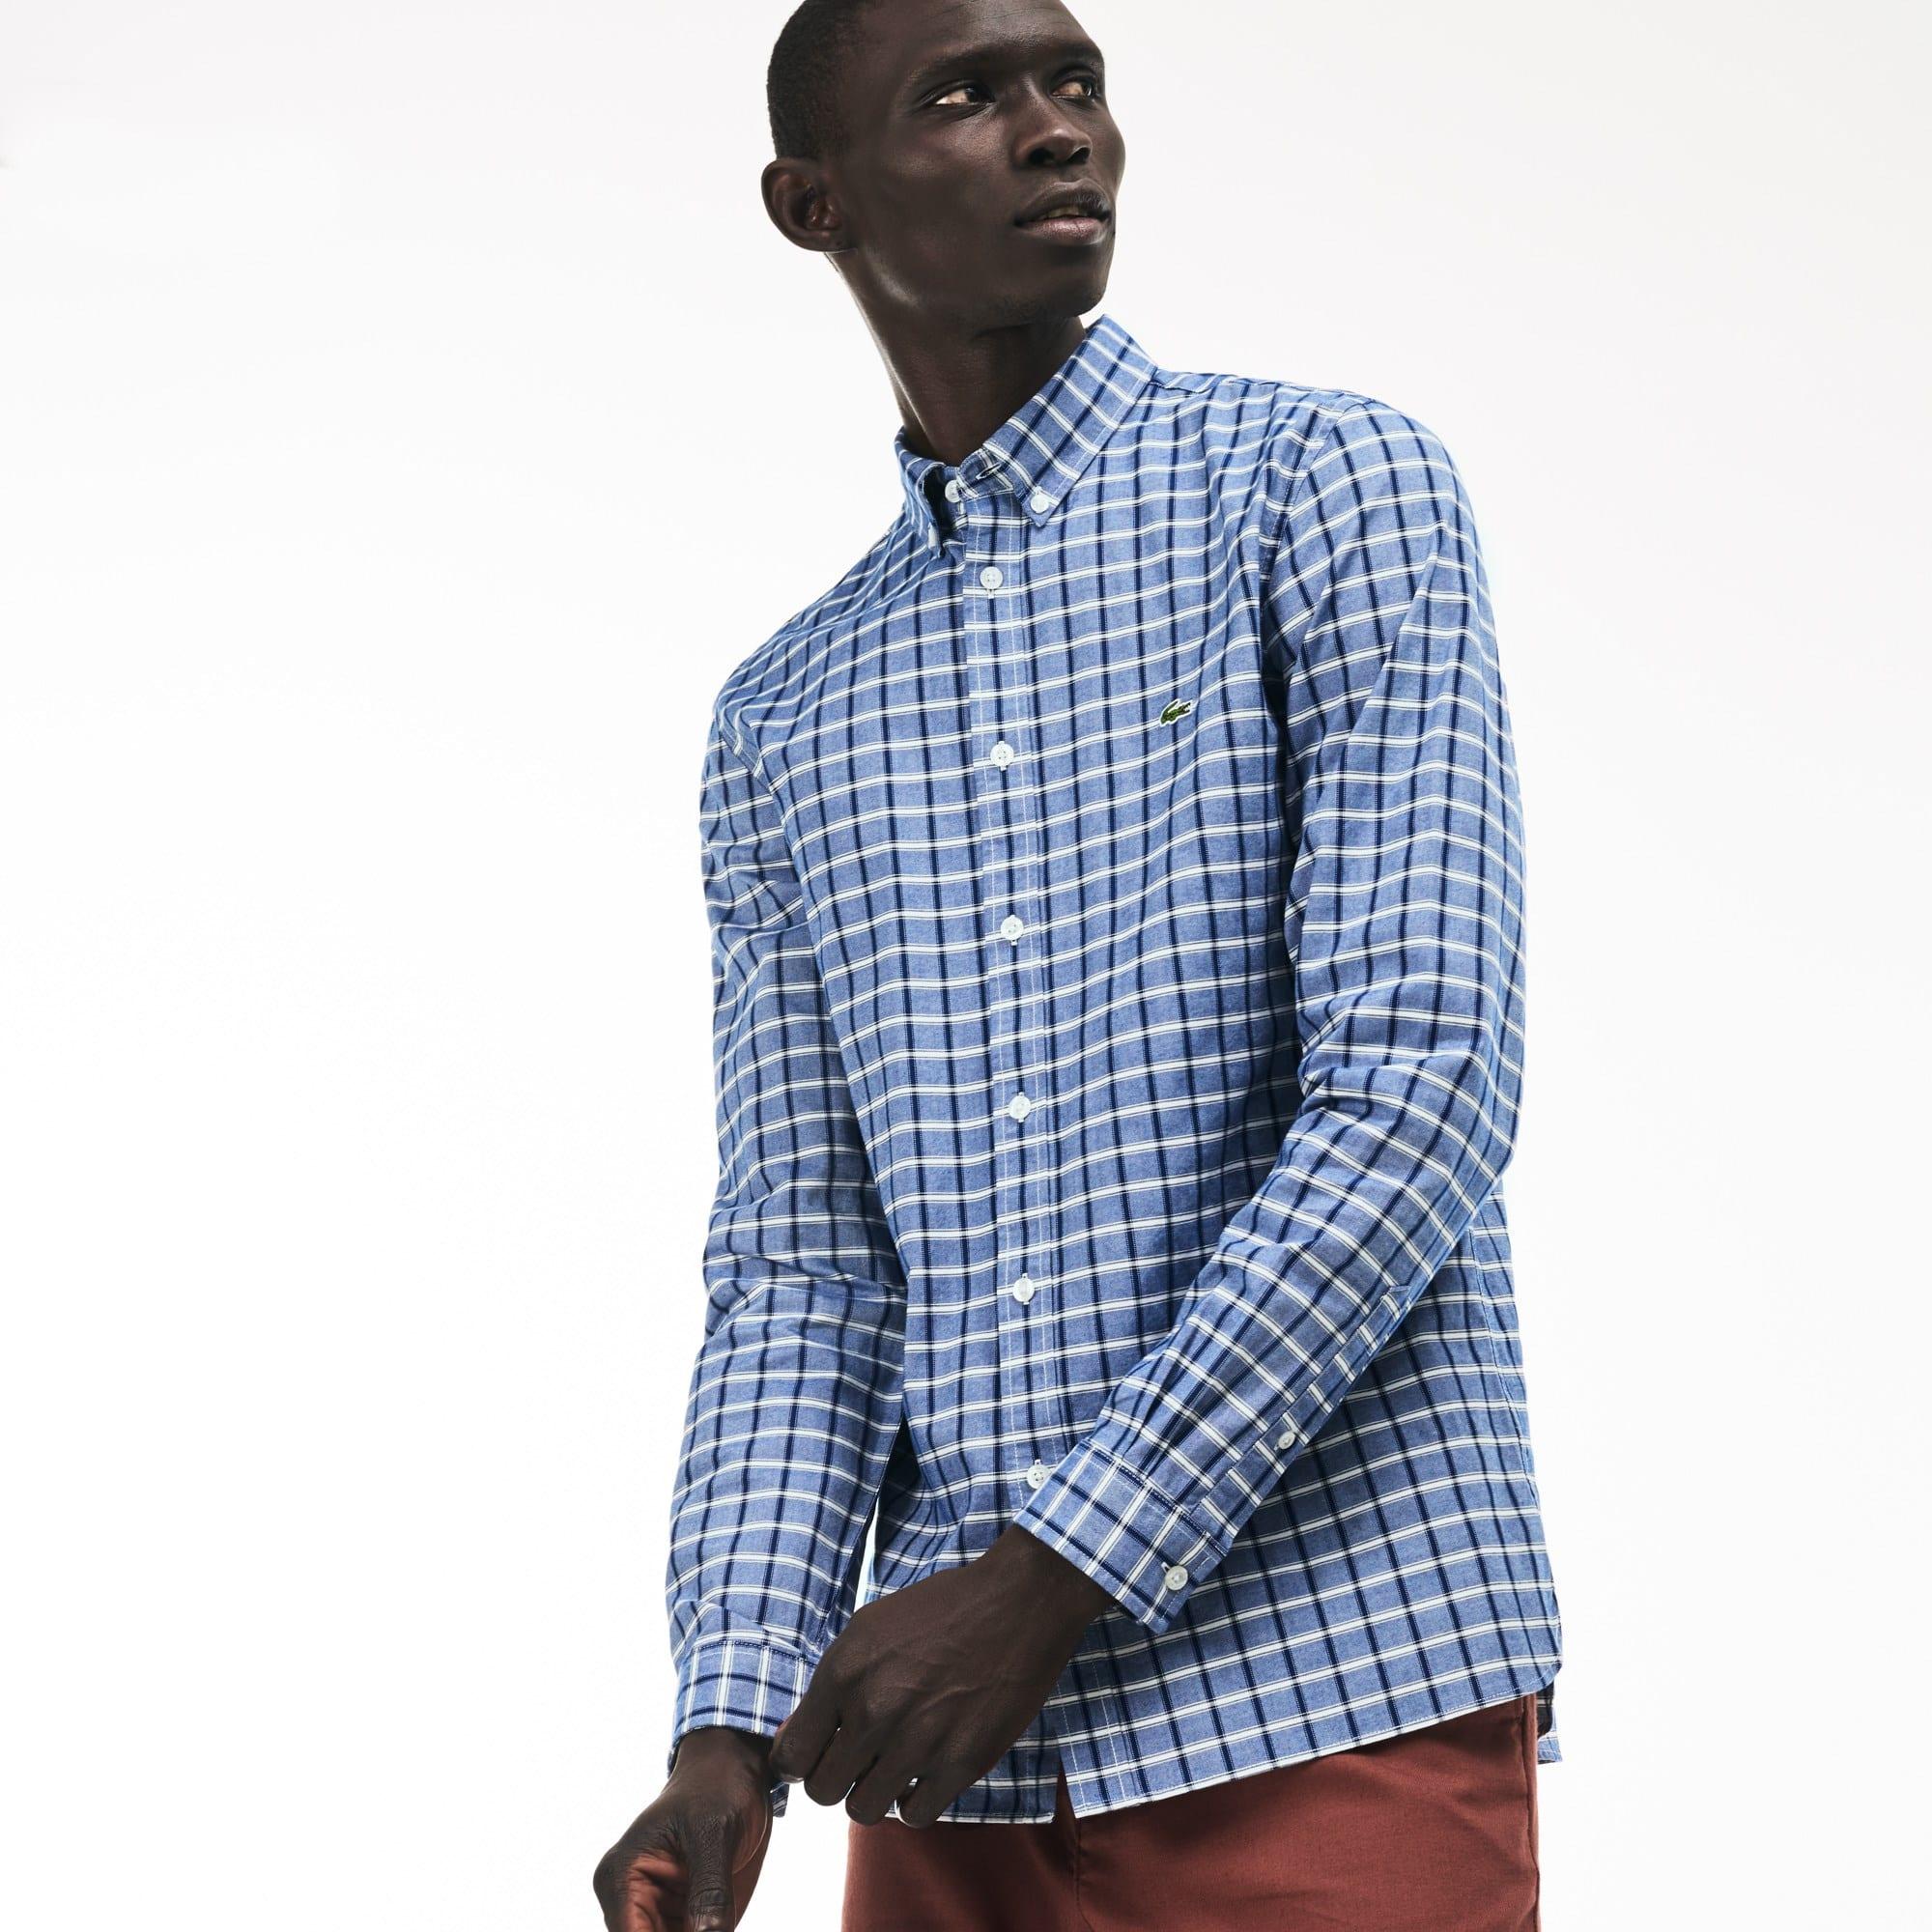 a3fde92e0 Men's Slim Fit Check Stretch Cotton Oxford Shirt | LACOSTE